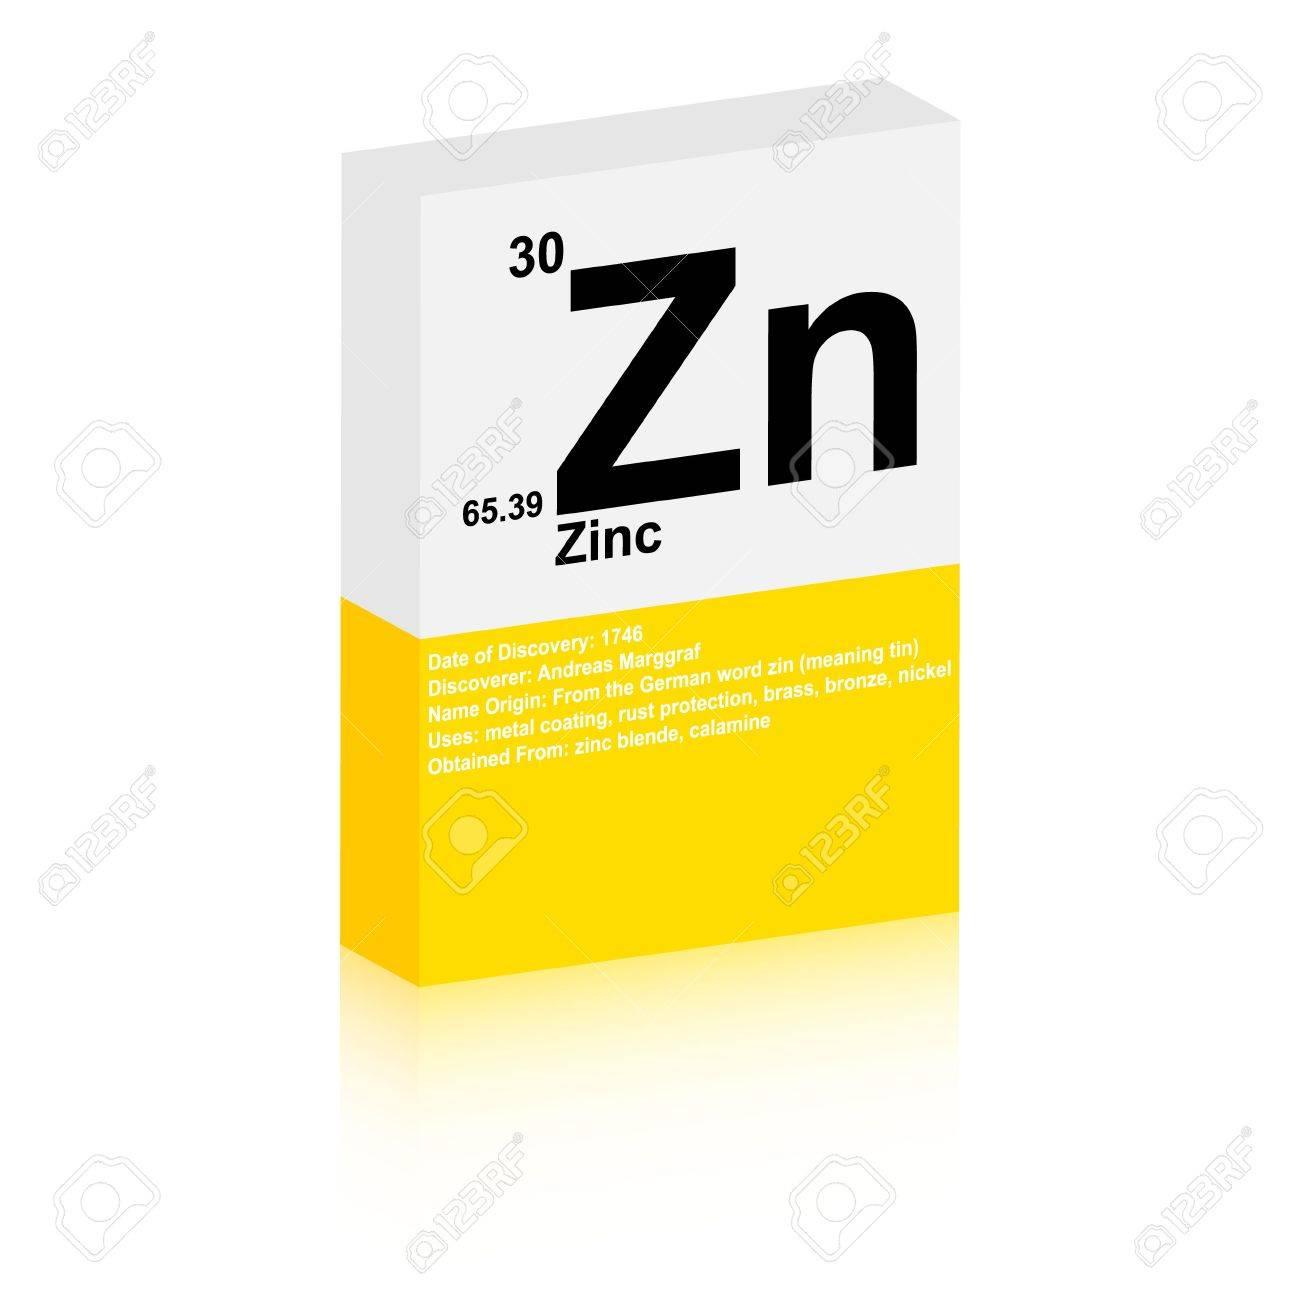 Zinc symbol royalty free cliparts vectors and stock illustration vector zinc symbol urtaz Gallery